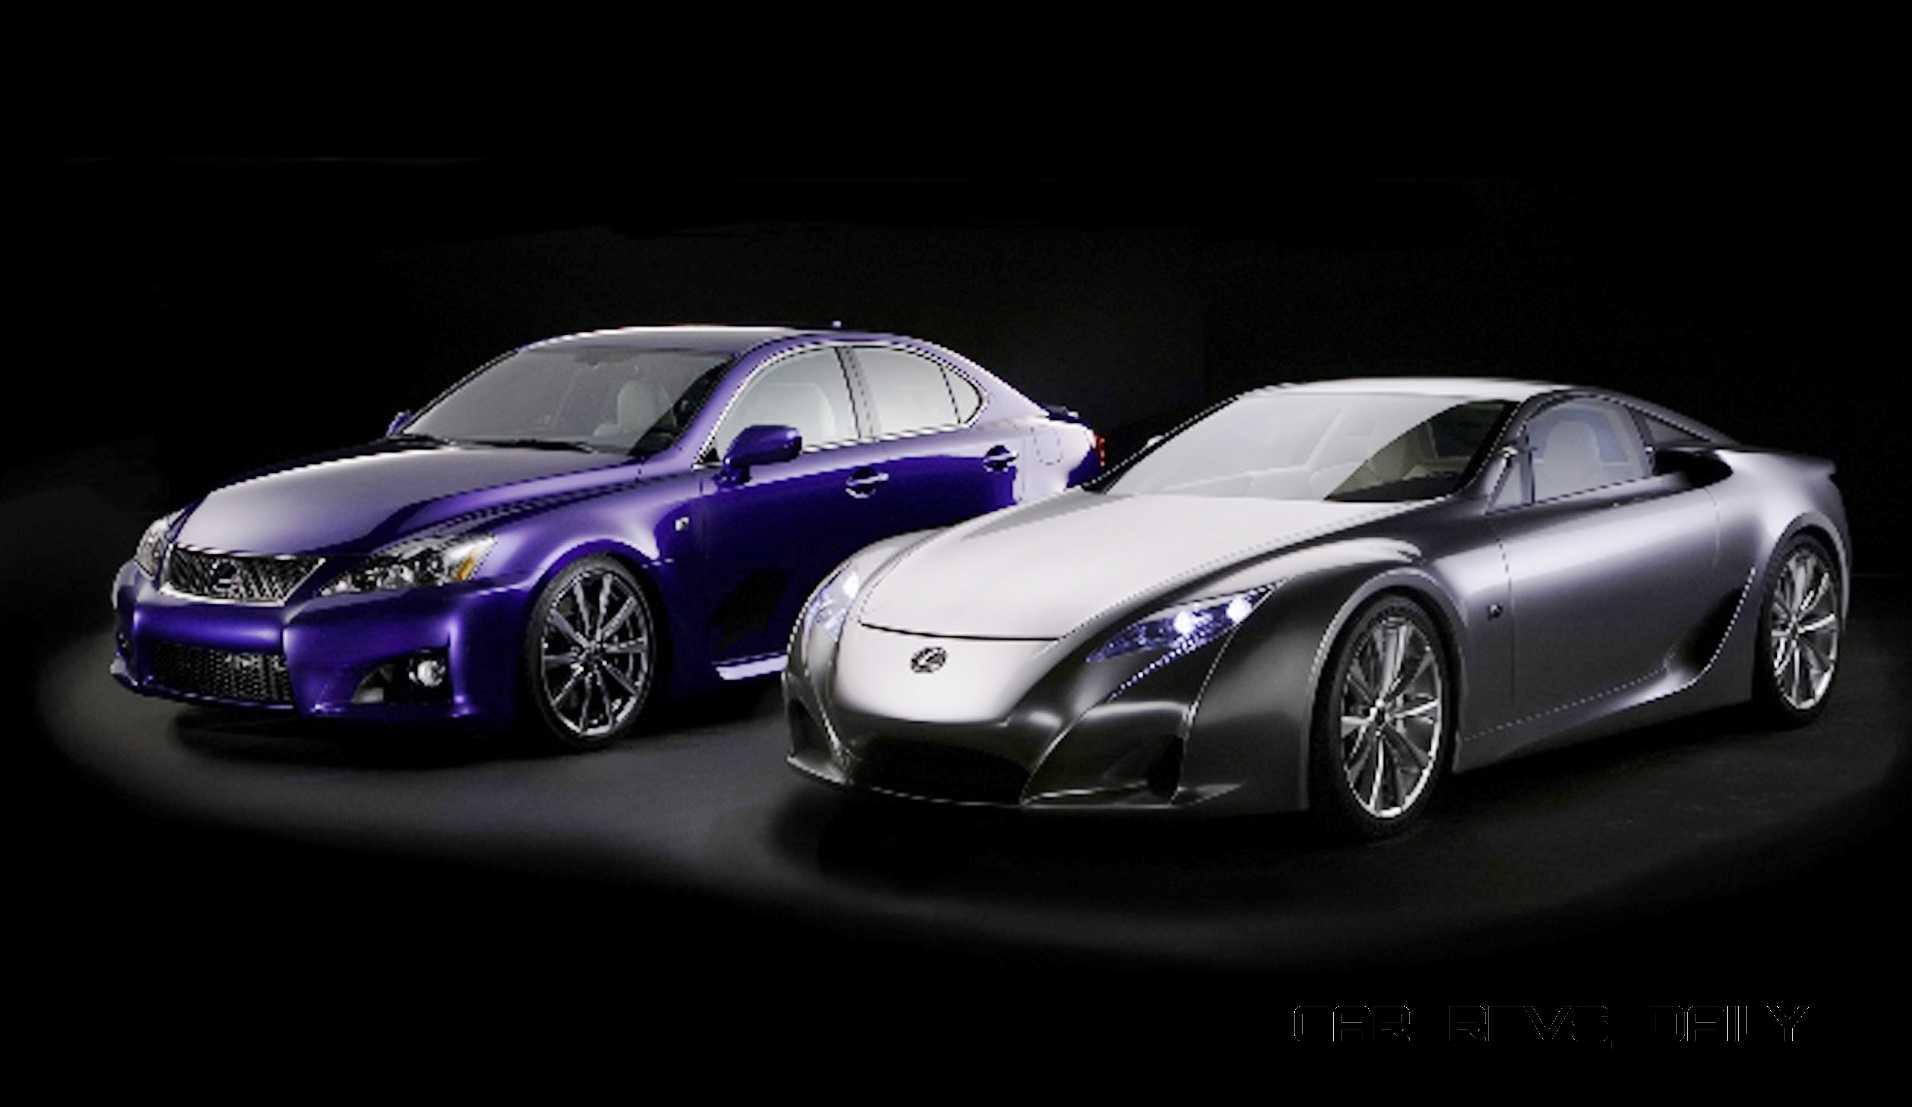 http://www.car-revs-daily.com/wp-content/uploads/2014/10/2005-Lexus-LFA-Coupe-11.jpg